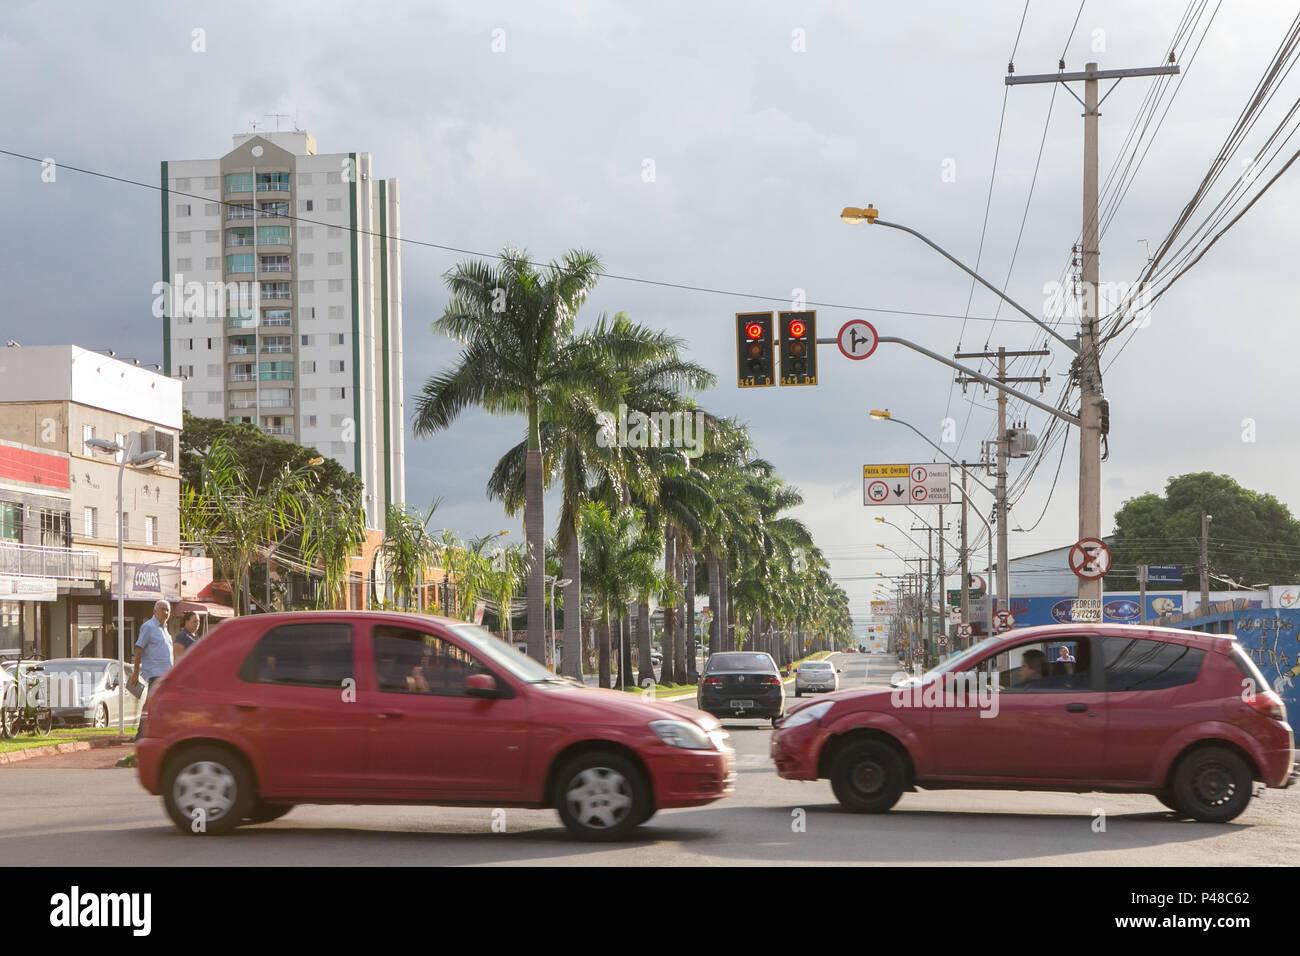 Goiânia, GO - 10.04.2015: RUA ARBORIZADA - Avenida T-063, Setor Nova Suiça. (Foto: Murilo Bastos / Fotoarena) Foto Stock